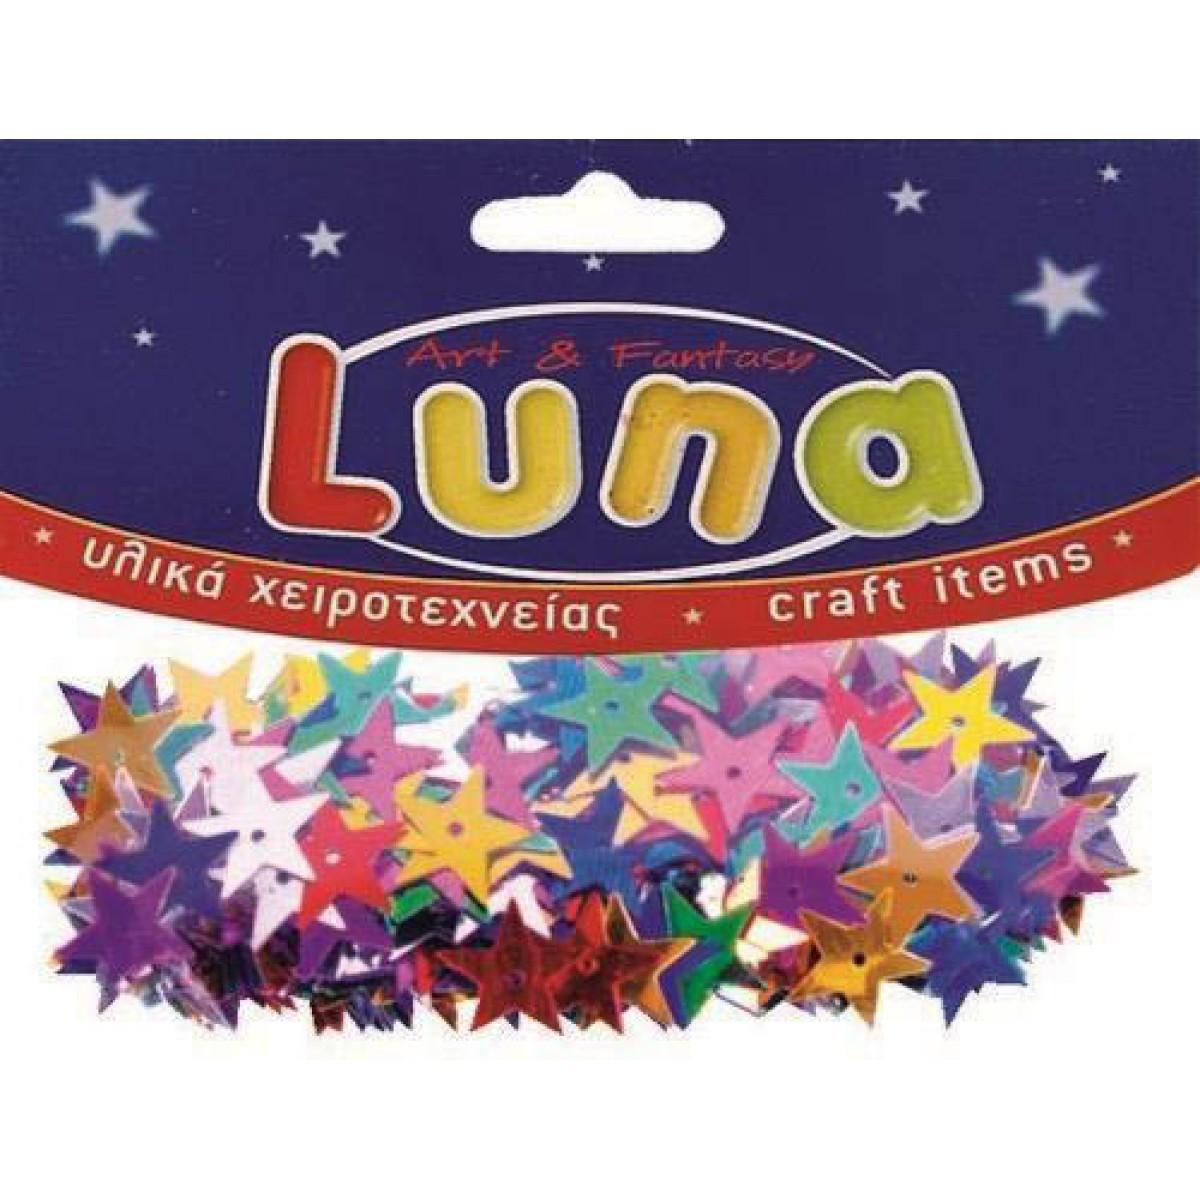 Luna Πούλιες Αστέρια (70 Τεμ.) Υλικά Χειροτεχνίας